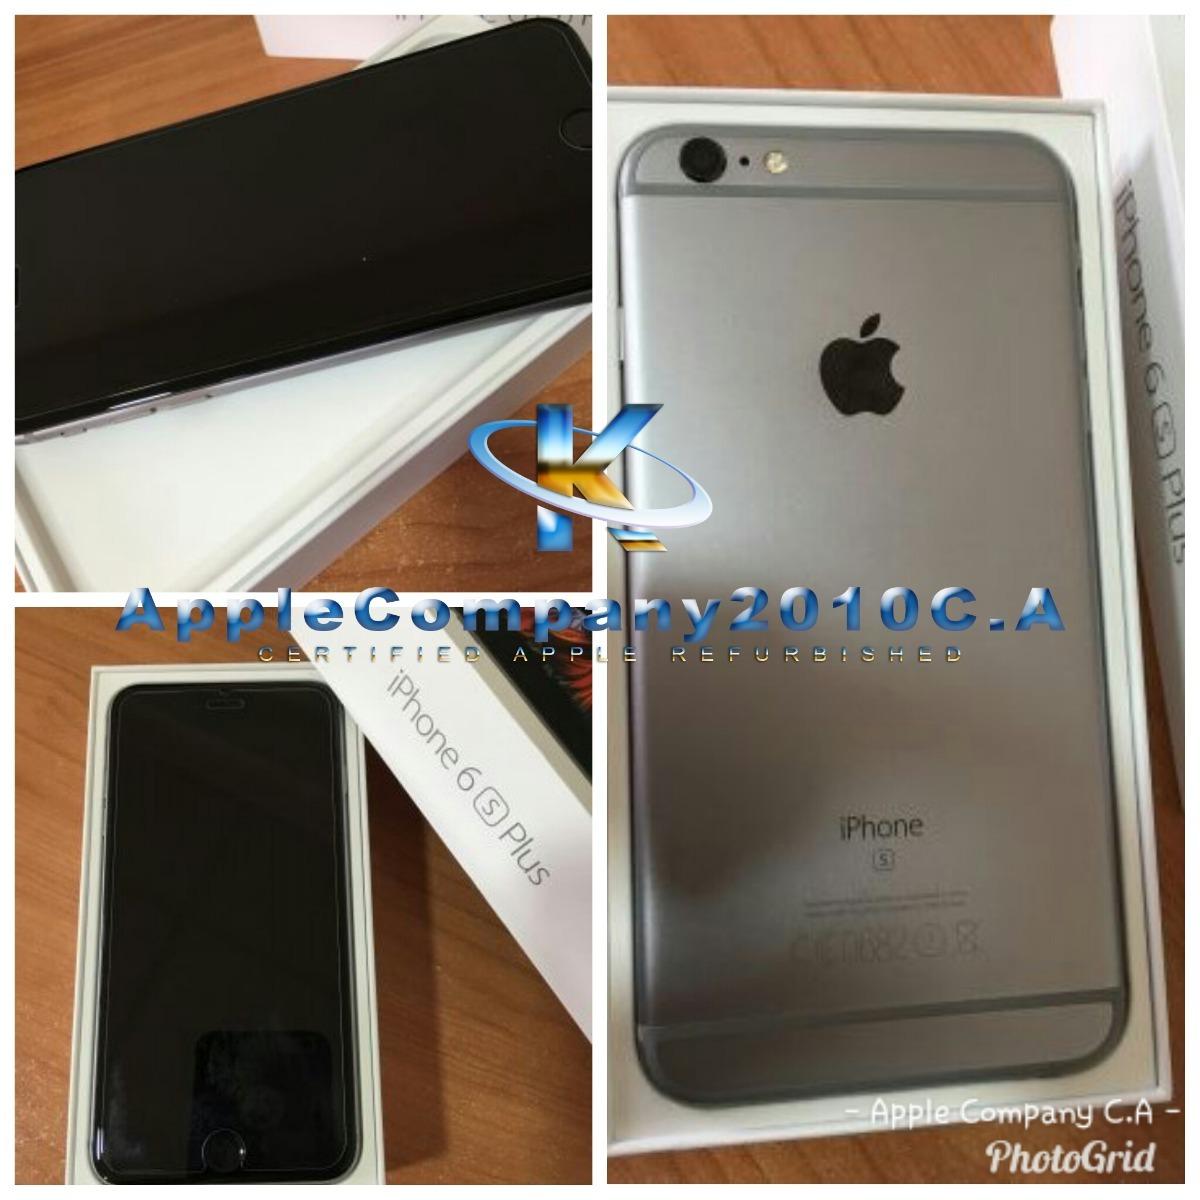 Iphone 5s 64gb Nuevo Certified Refurbished Tienda Fisica Bs 1 Apple 16gb Unlocked Boxed Original Not